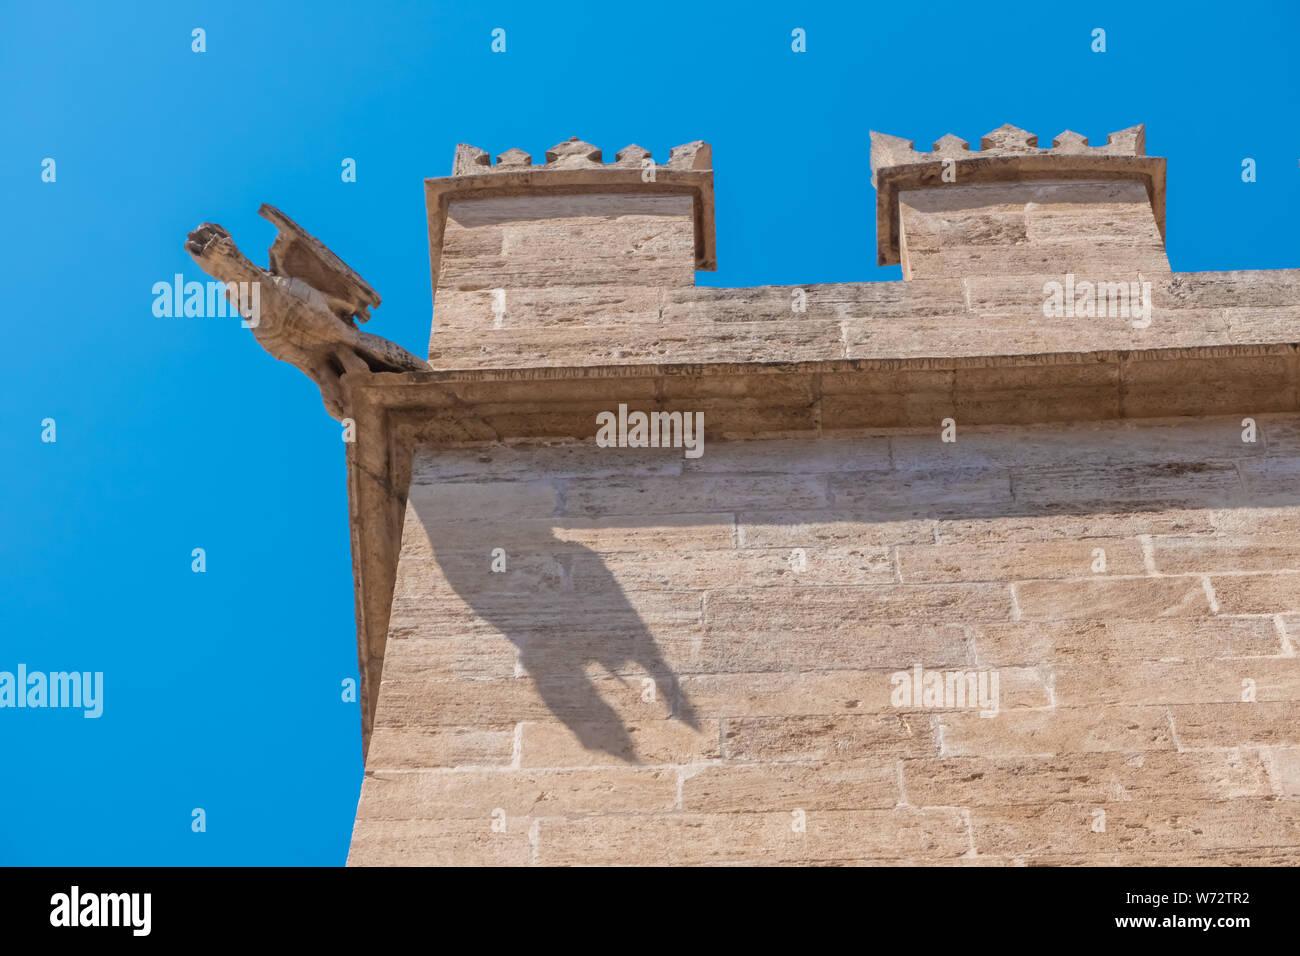 The Llotja de la Seda  (Medieval Silk Exchange), a late Valencian Gothic-style civil building in Valencia, Spain. Stock Photo